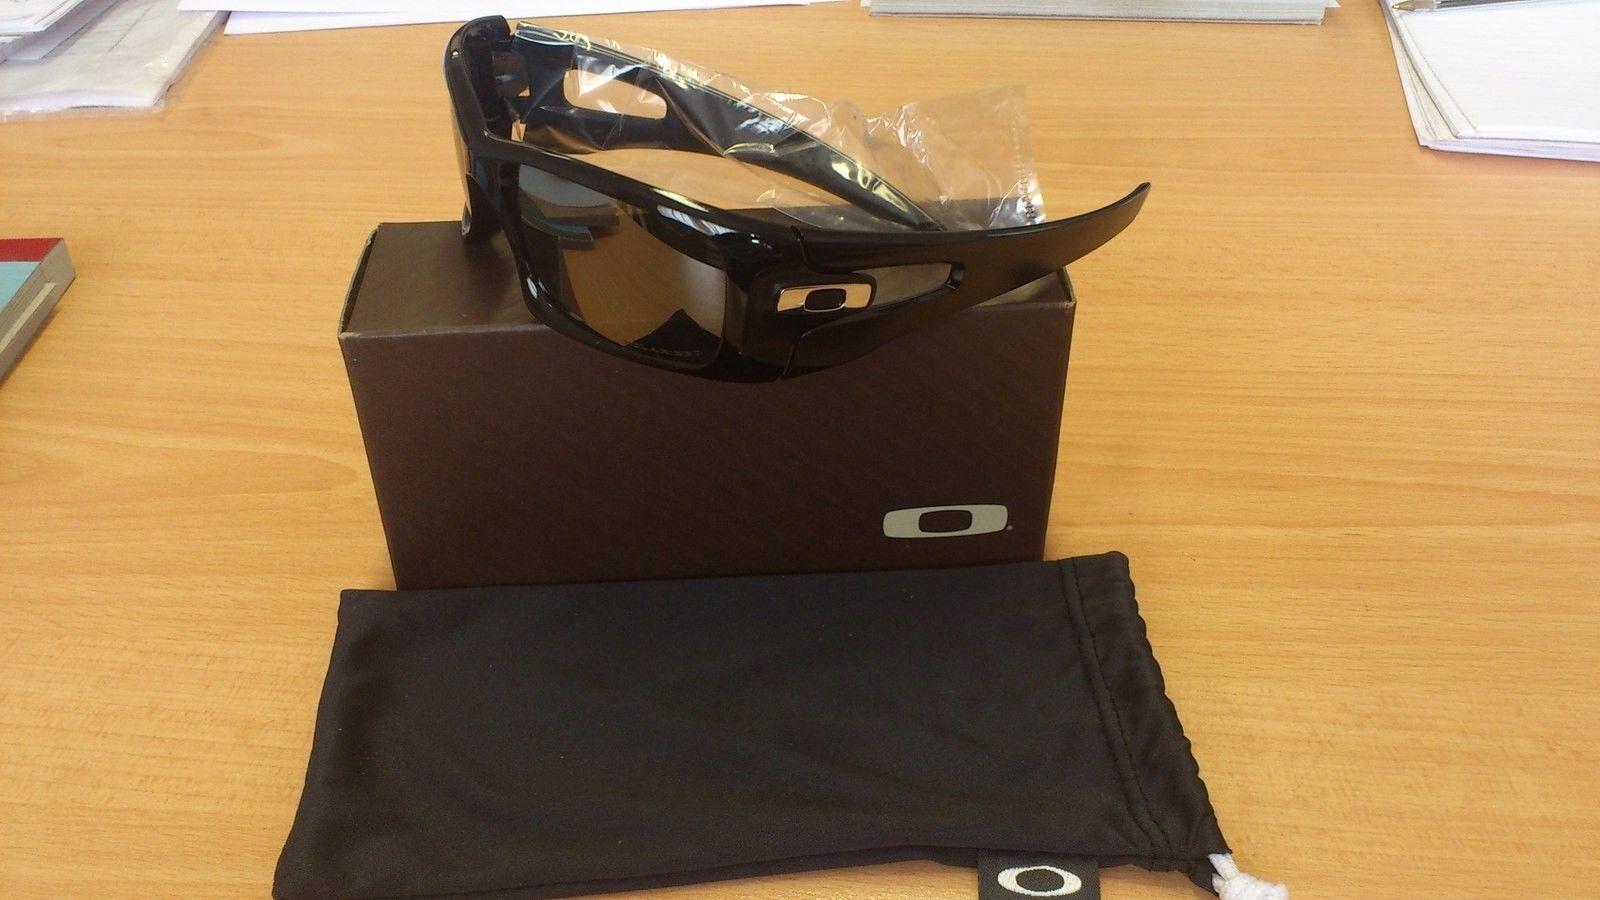 Black Crankcase With Black Iridium Lenses - blackcrank1.jpg